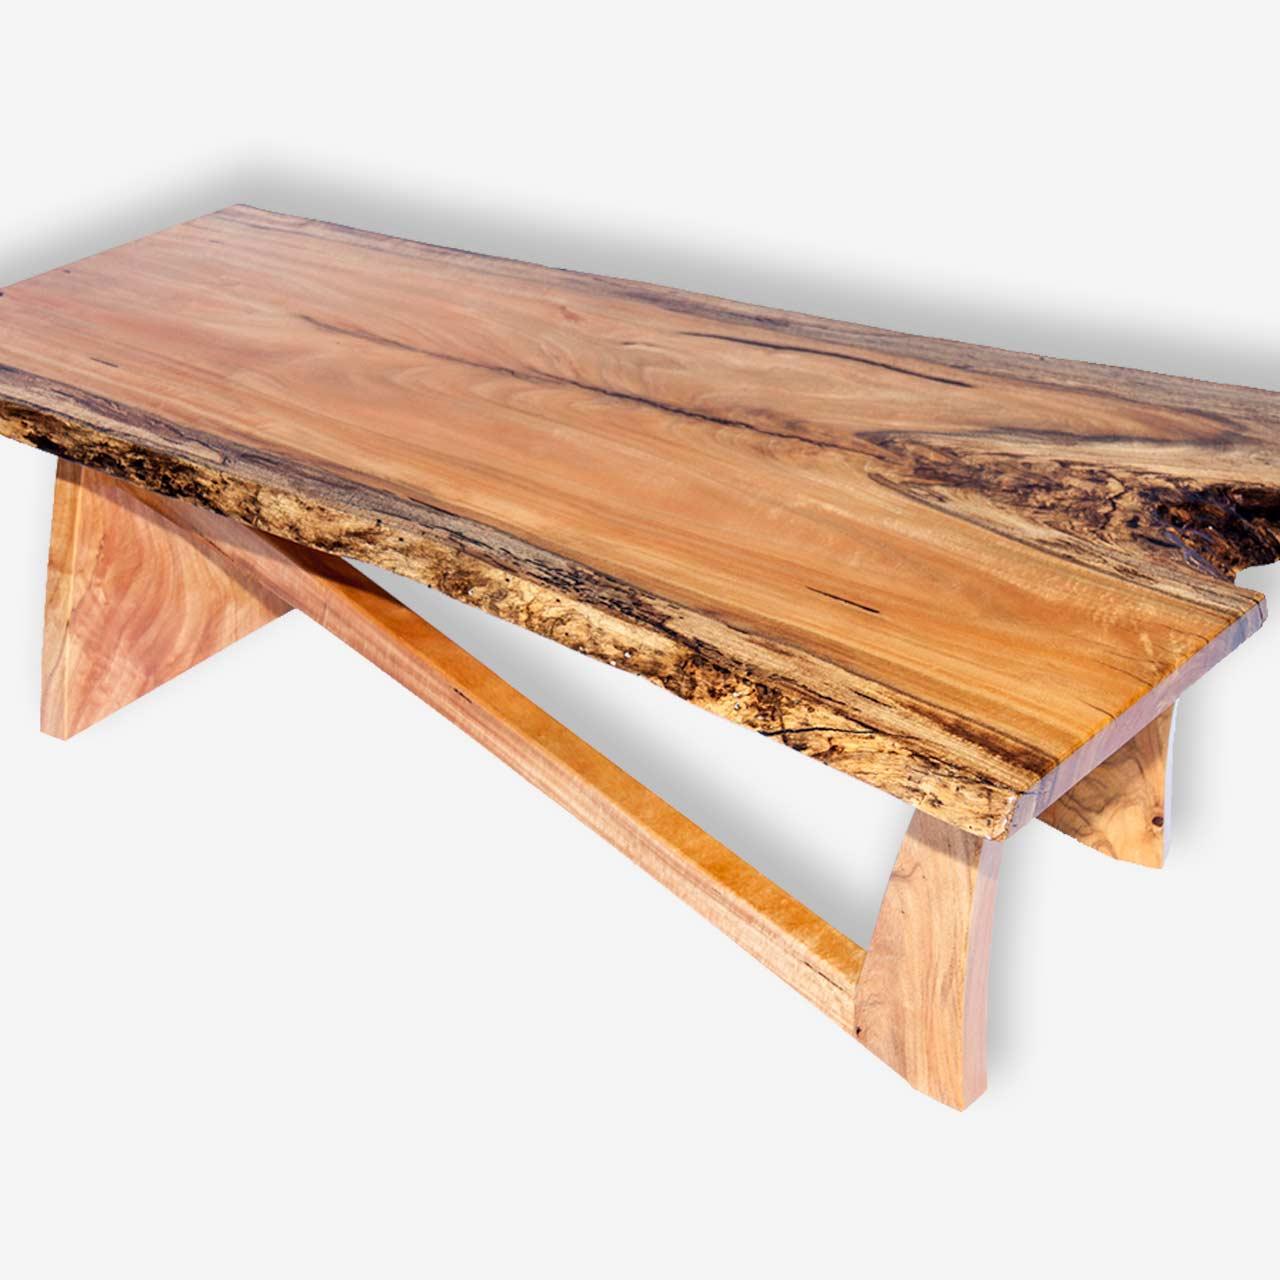 Corymbia Coffee Table Treeton Fine Wood Studio : corymbia marri coffee table cowaramup busselton margaret river perth2 from treetonfinewoodstudio.com.au size 1280 x 1280 jpeg 91kB